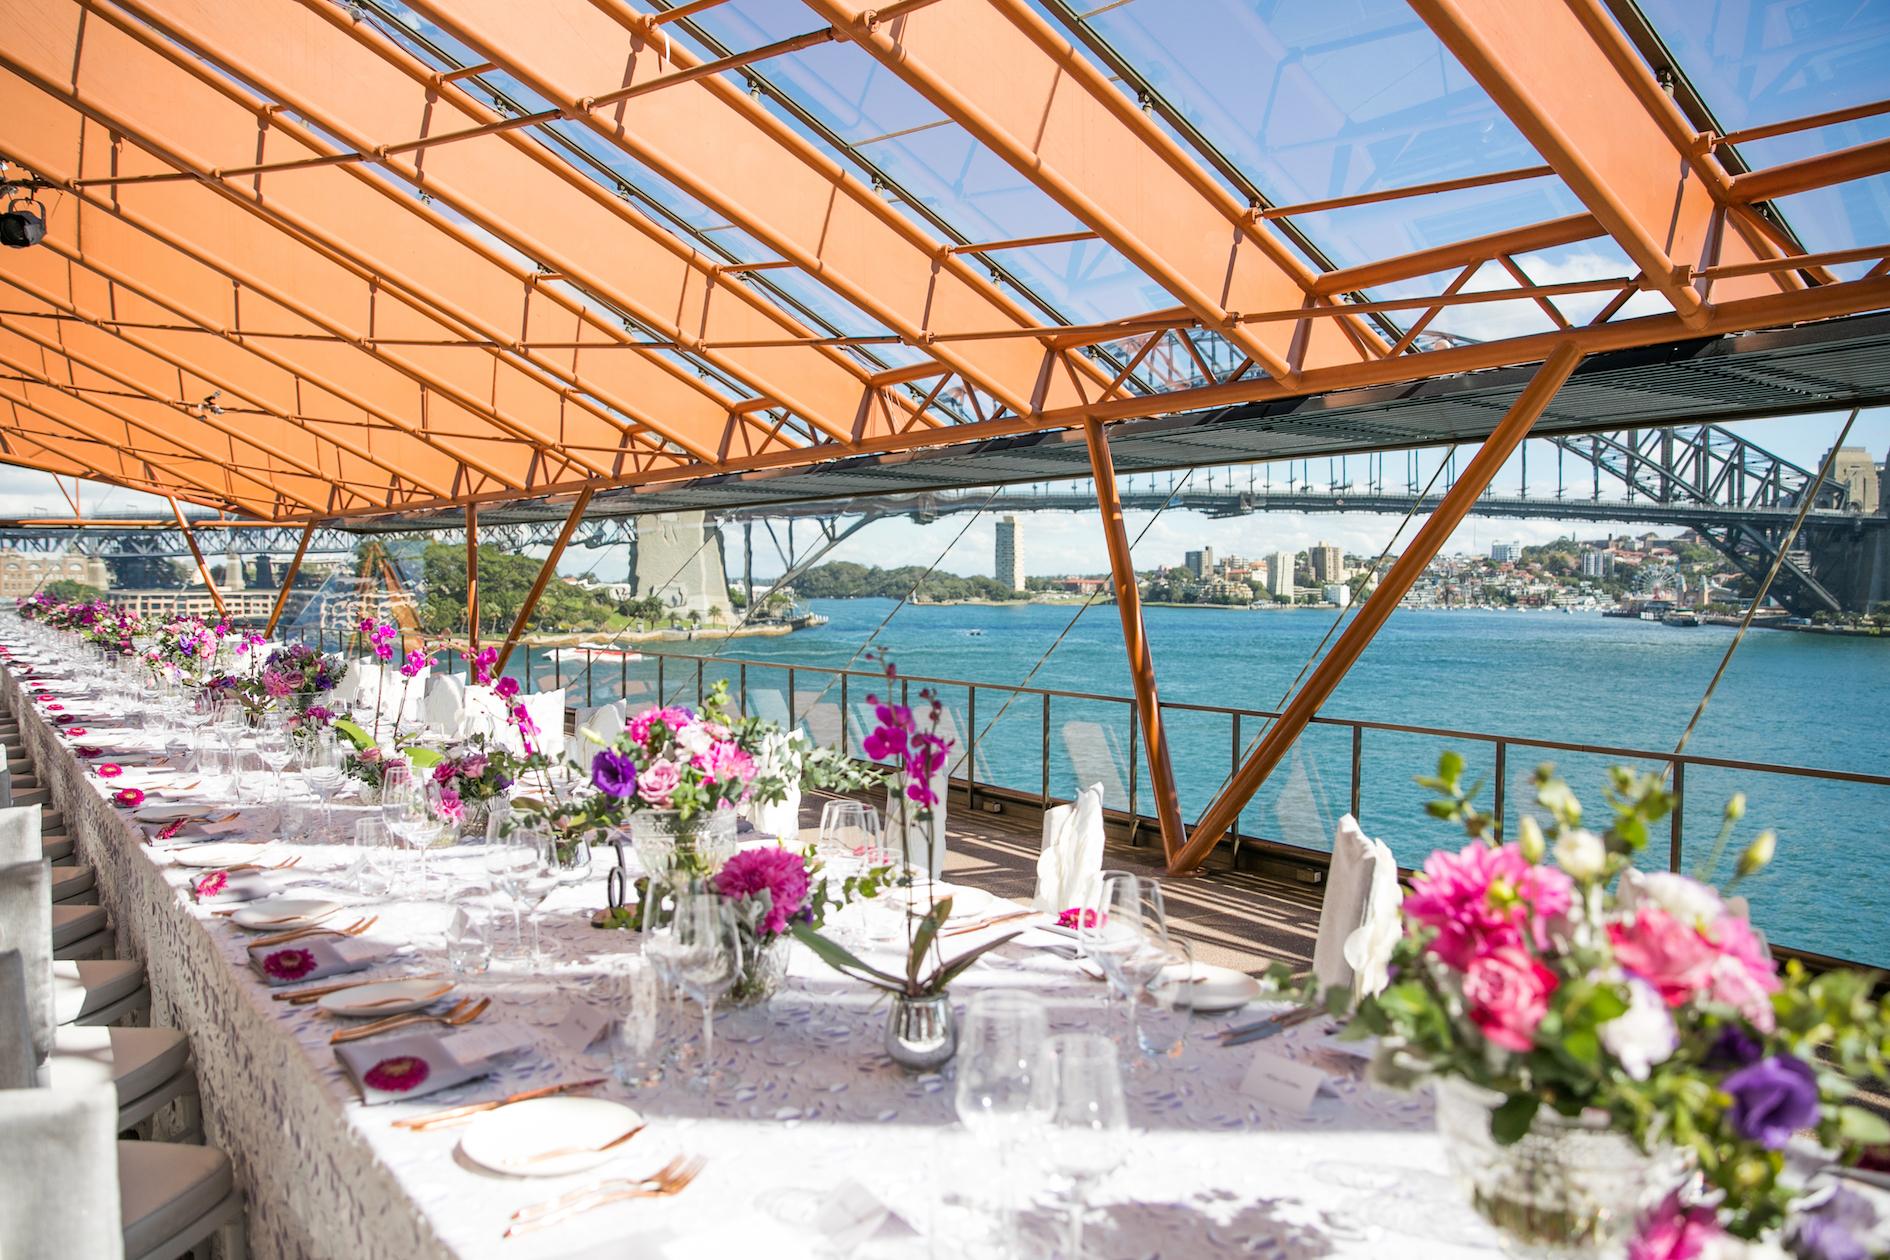 international_womens_day_sydney_opera_house_event_pink_purple_flowers_centrepiece.jpg